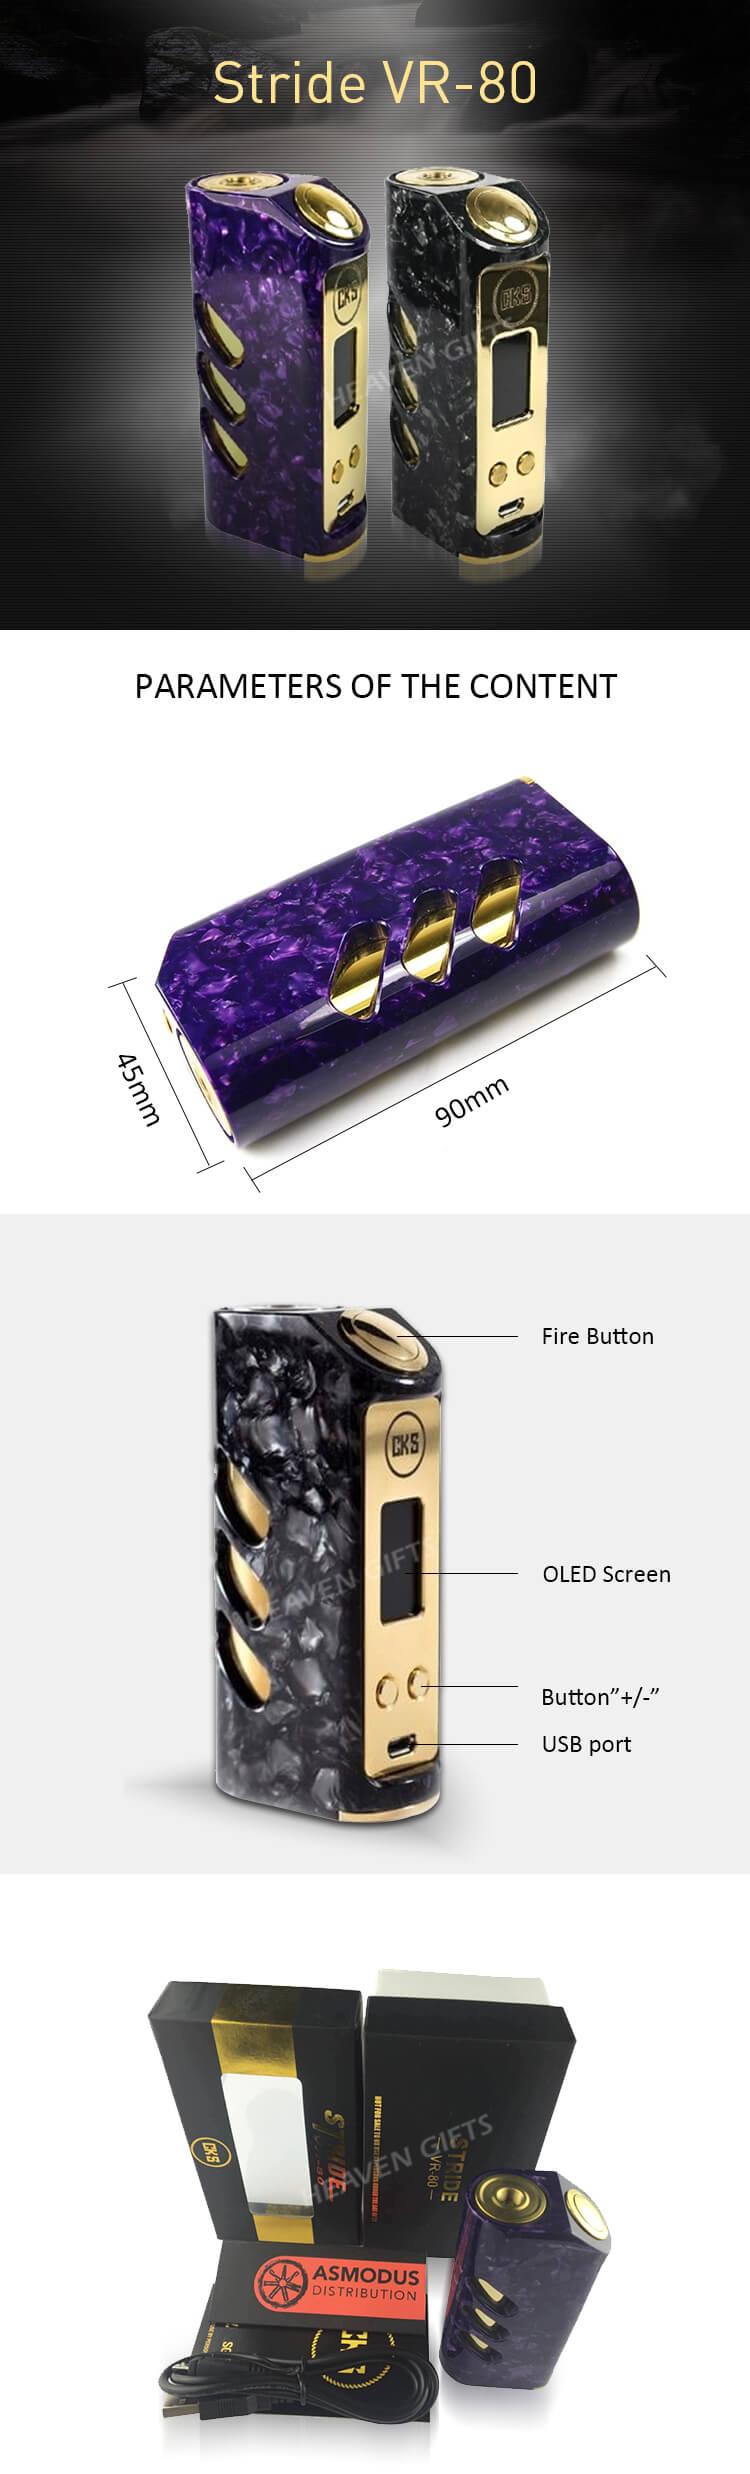 Colorful Hybrid Stone Design 80w Cks Stride Vr-80 Mod - Buy Stride  Vr-80,Cks Stride Vr-80,Cks Stride Vr-80 Mod Product on Alibaba com